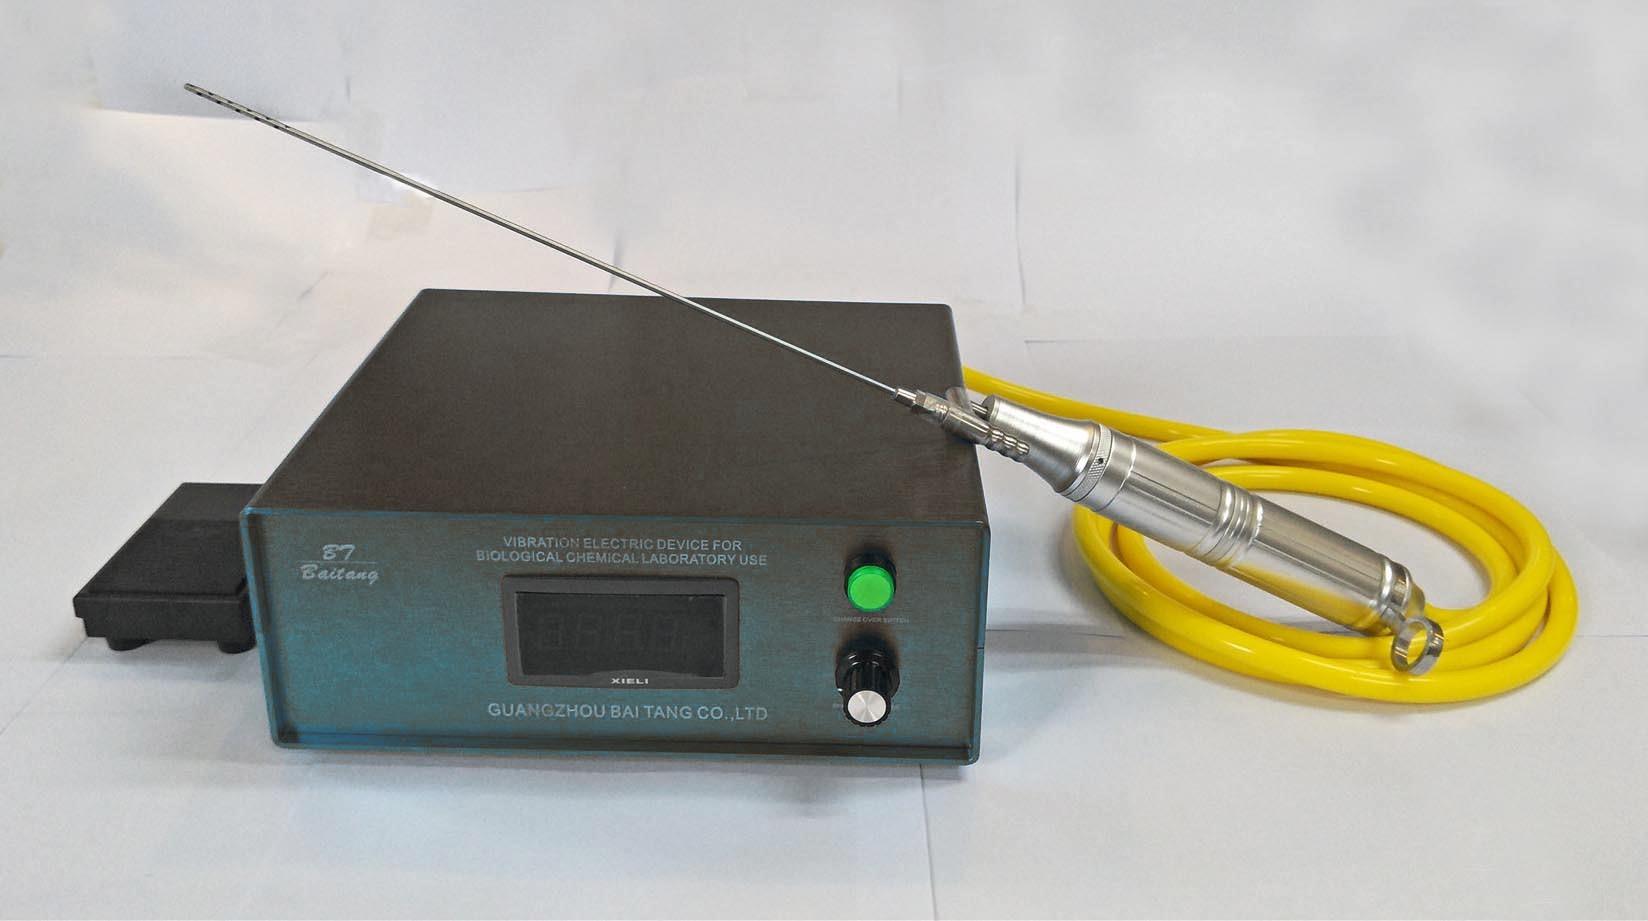 Medical Electric Resonance Liposuction Device